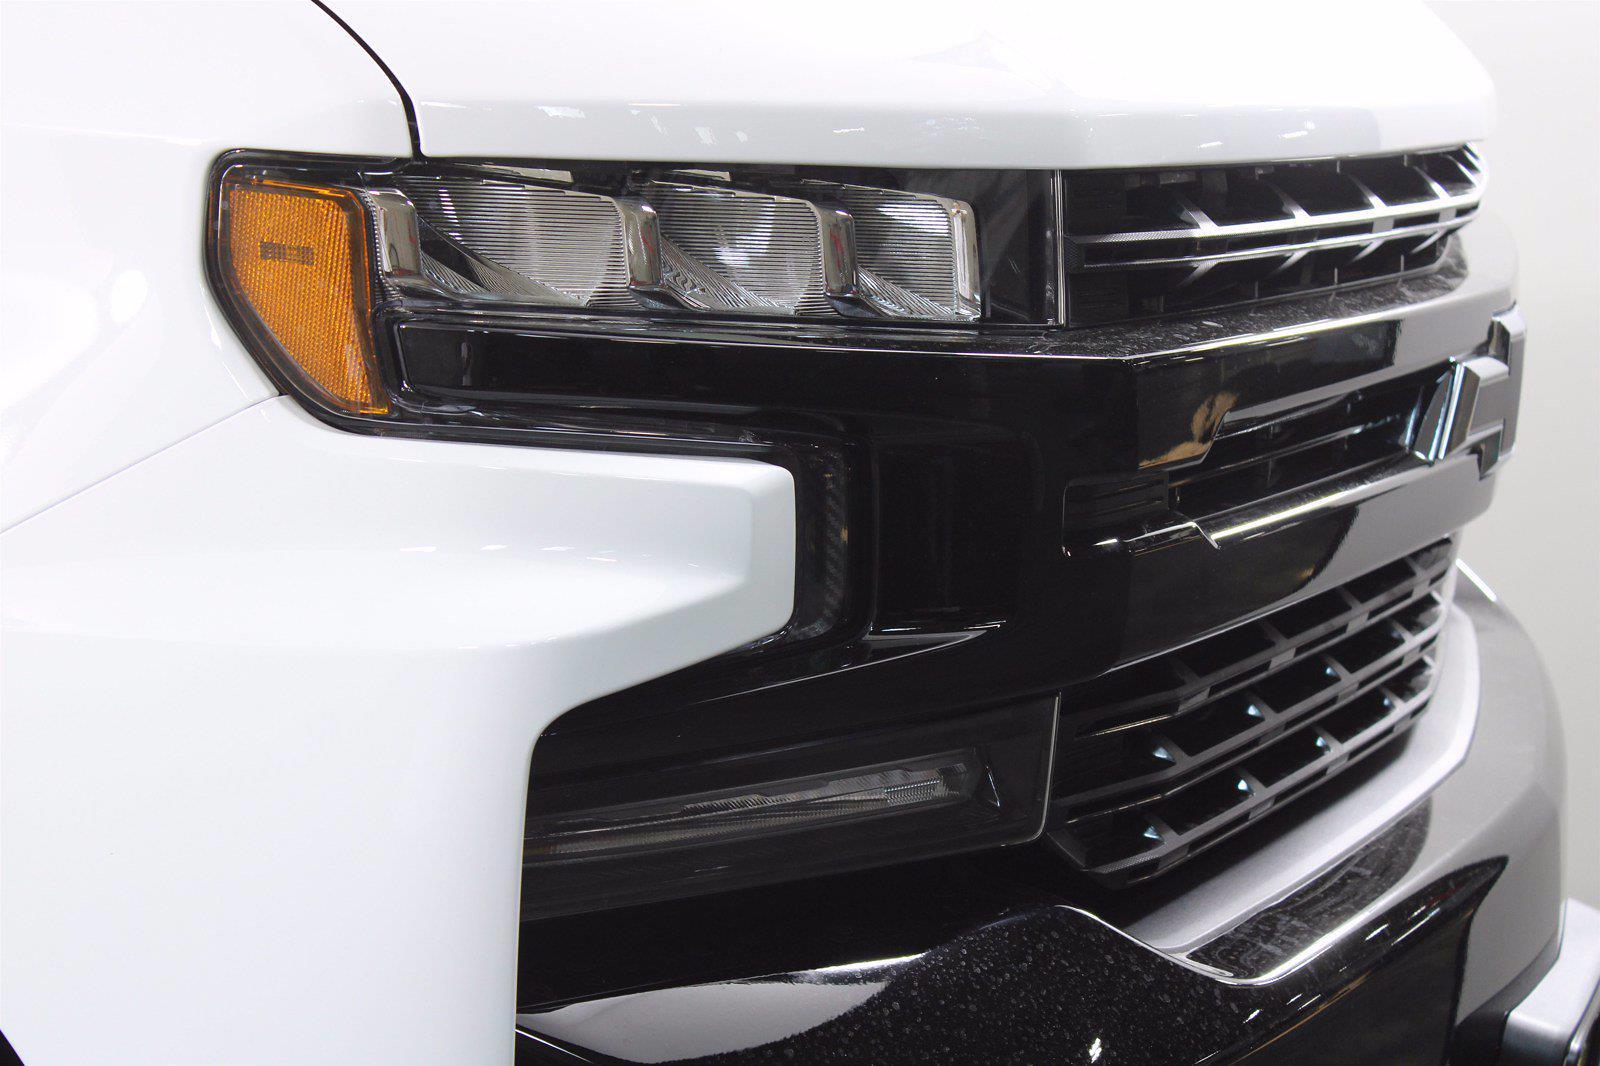 2021 Chevrolet Silverado 1500 Crew Cab 4x4, Pickup #D111110 - photo 5